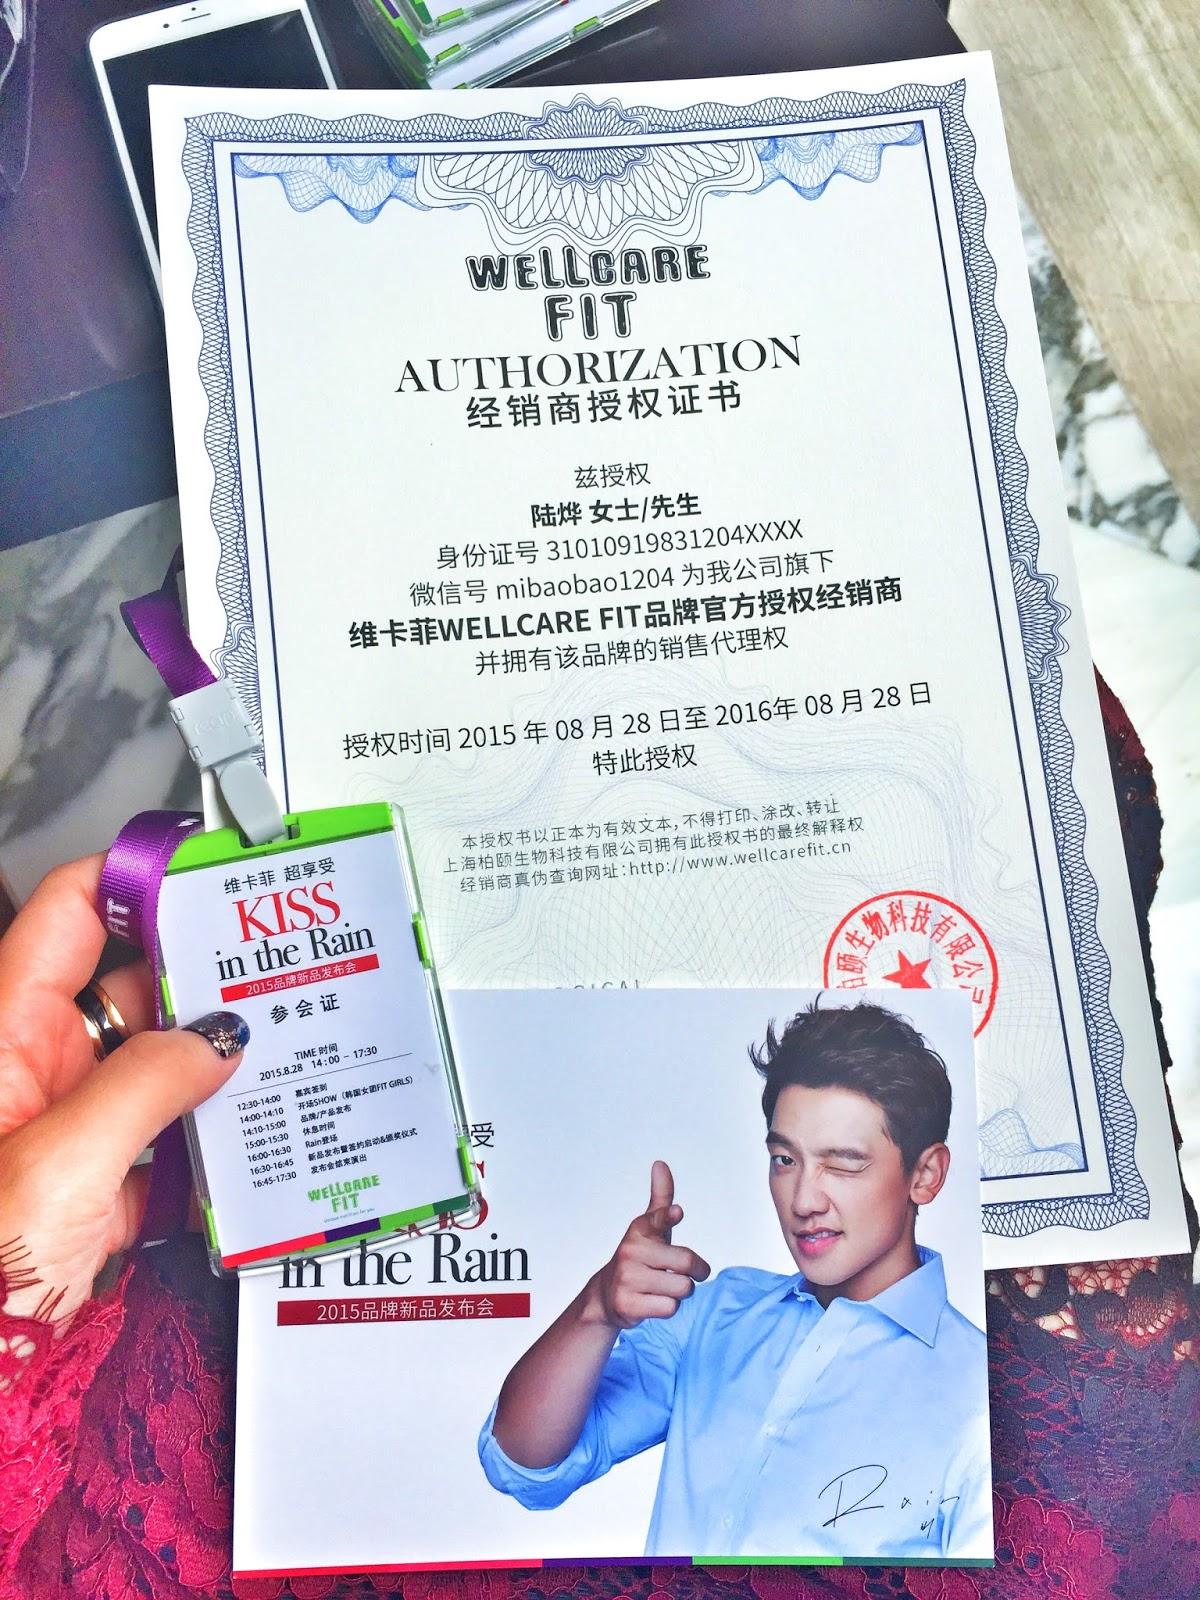 Rain Wellcarefit Press Con in Shanghai_c0047605_13295360.jpg